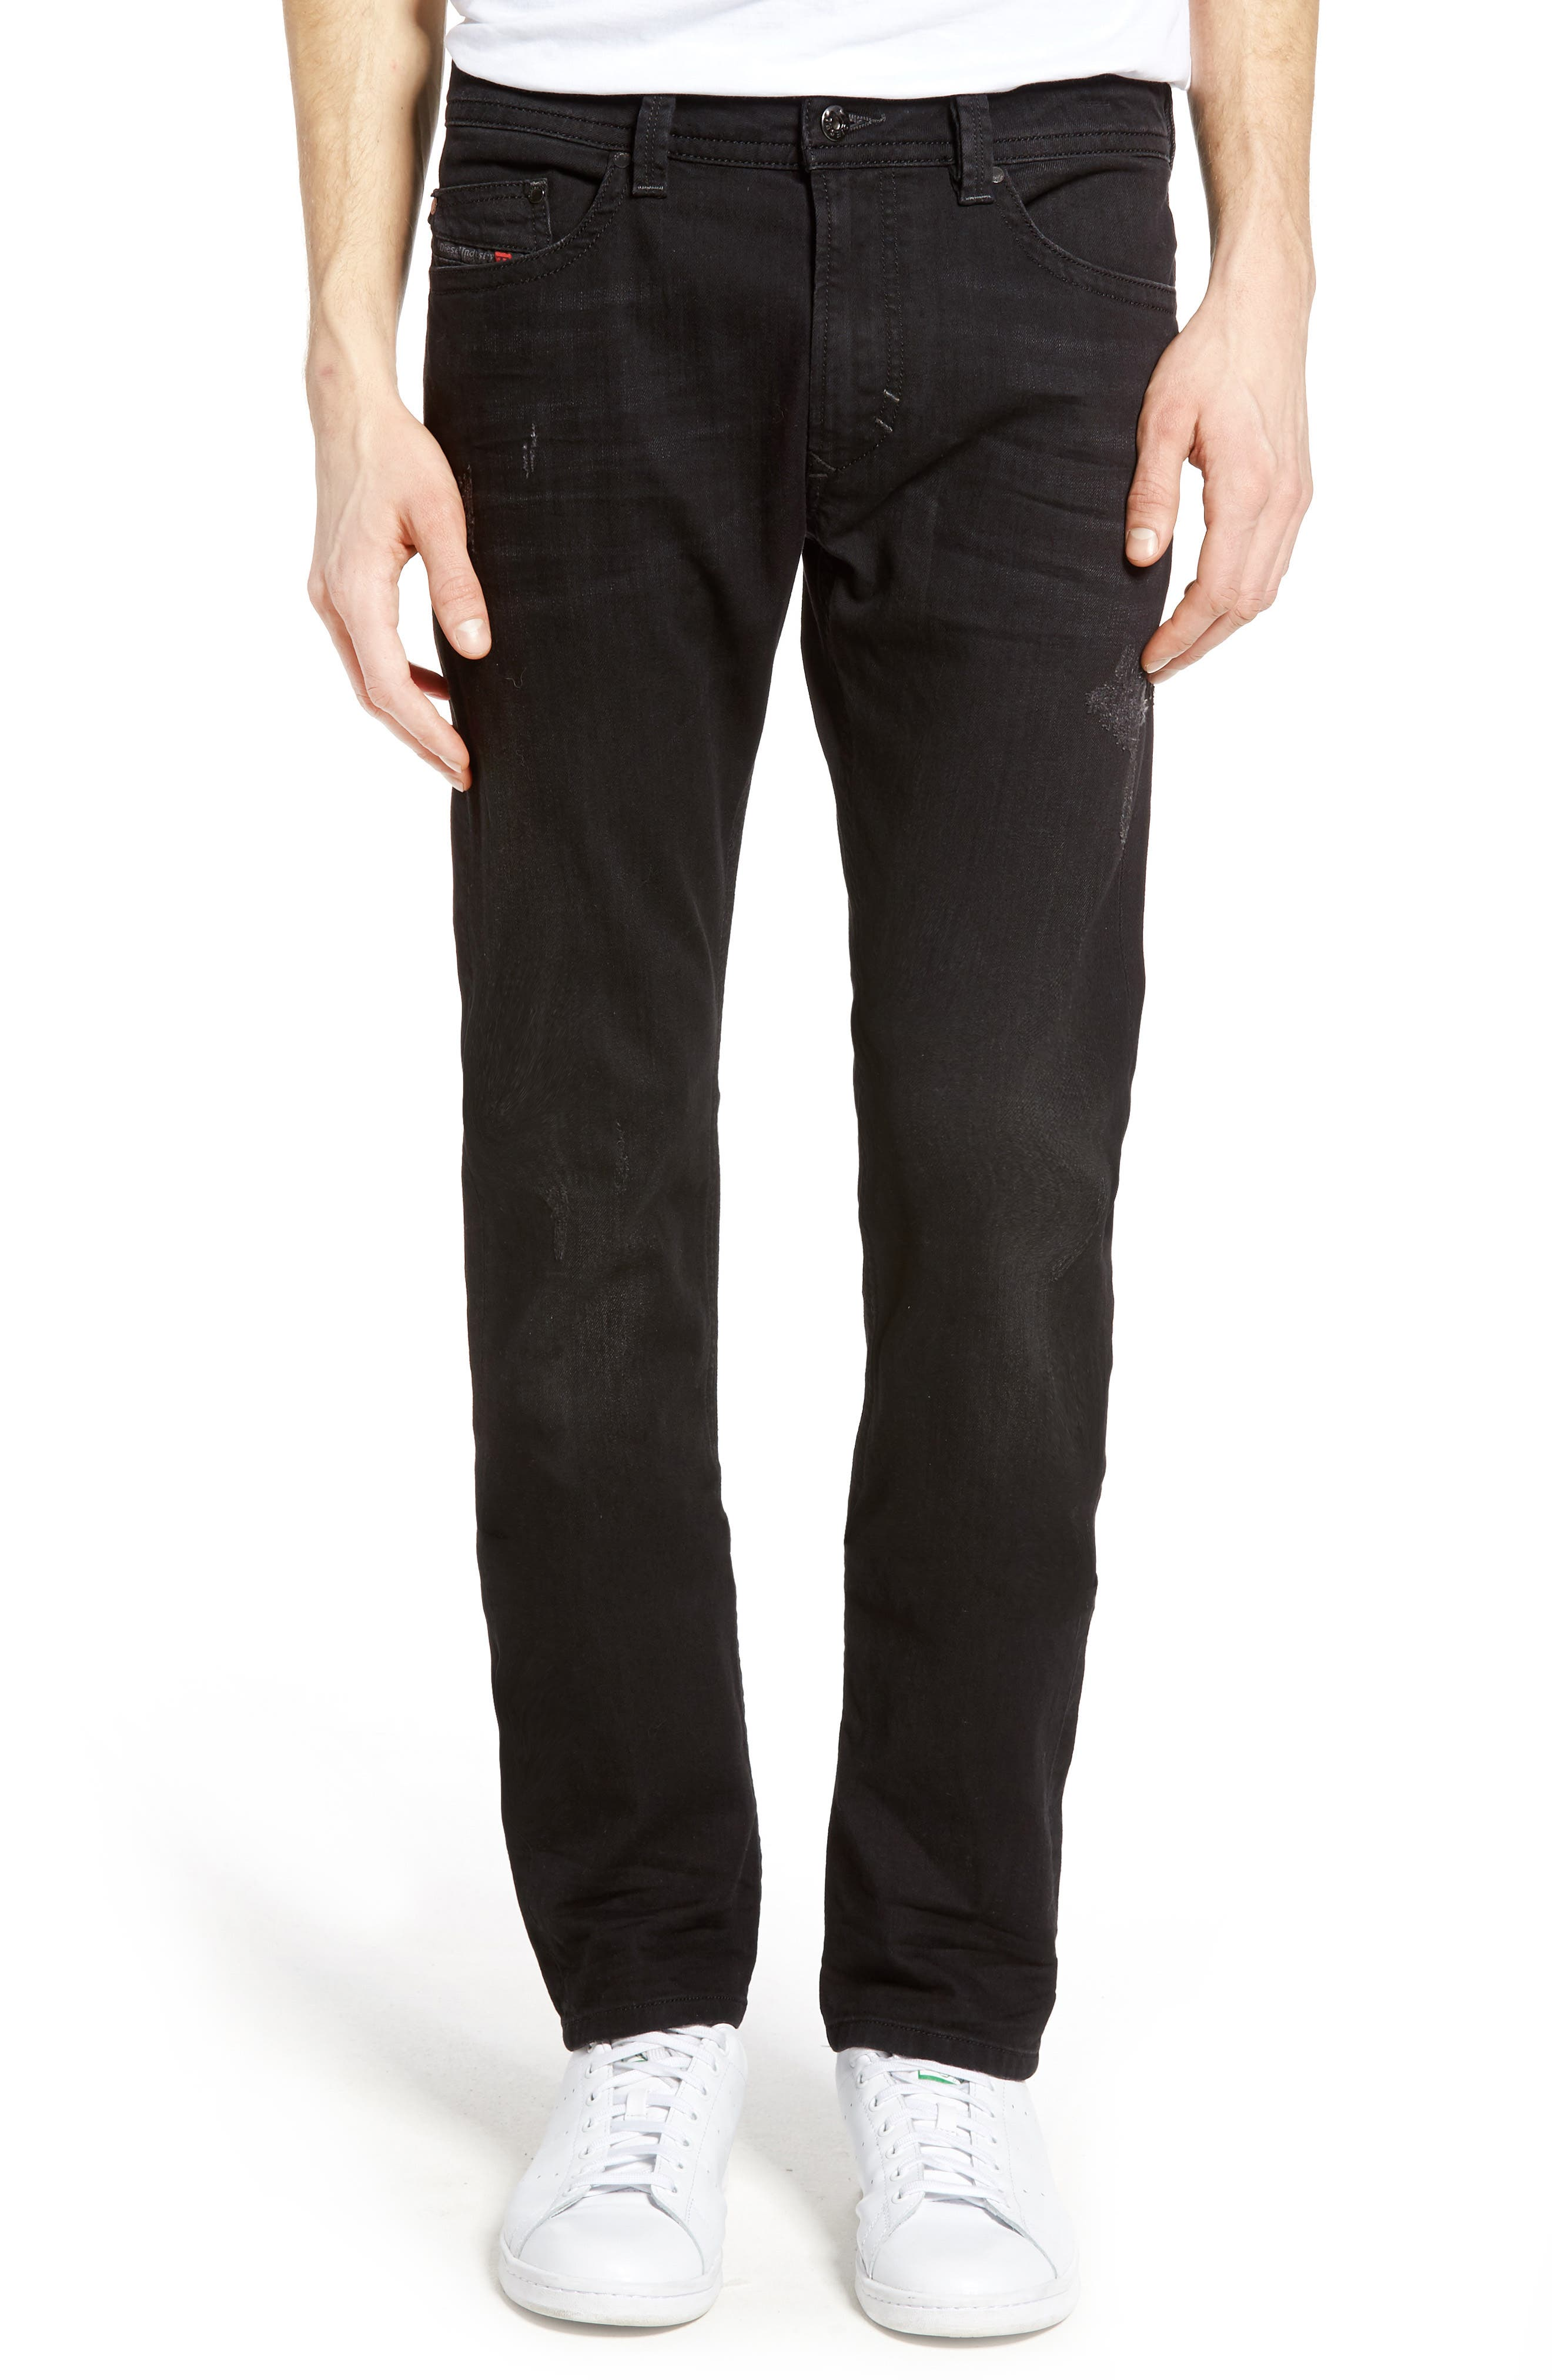 Thavar Skinny Fit Jeans,                             Main thumbnail 1, color,                             008